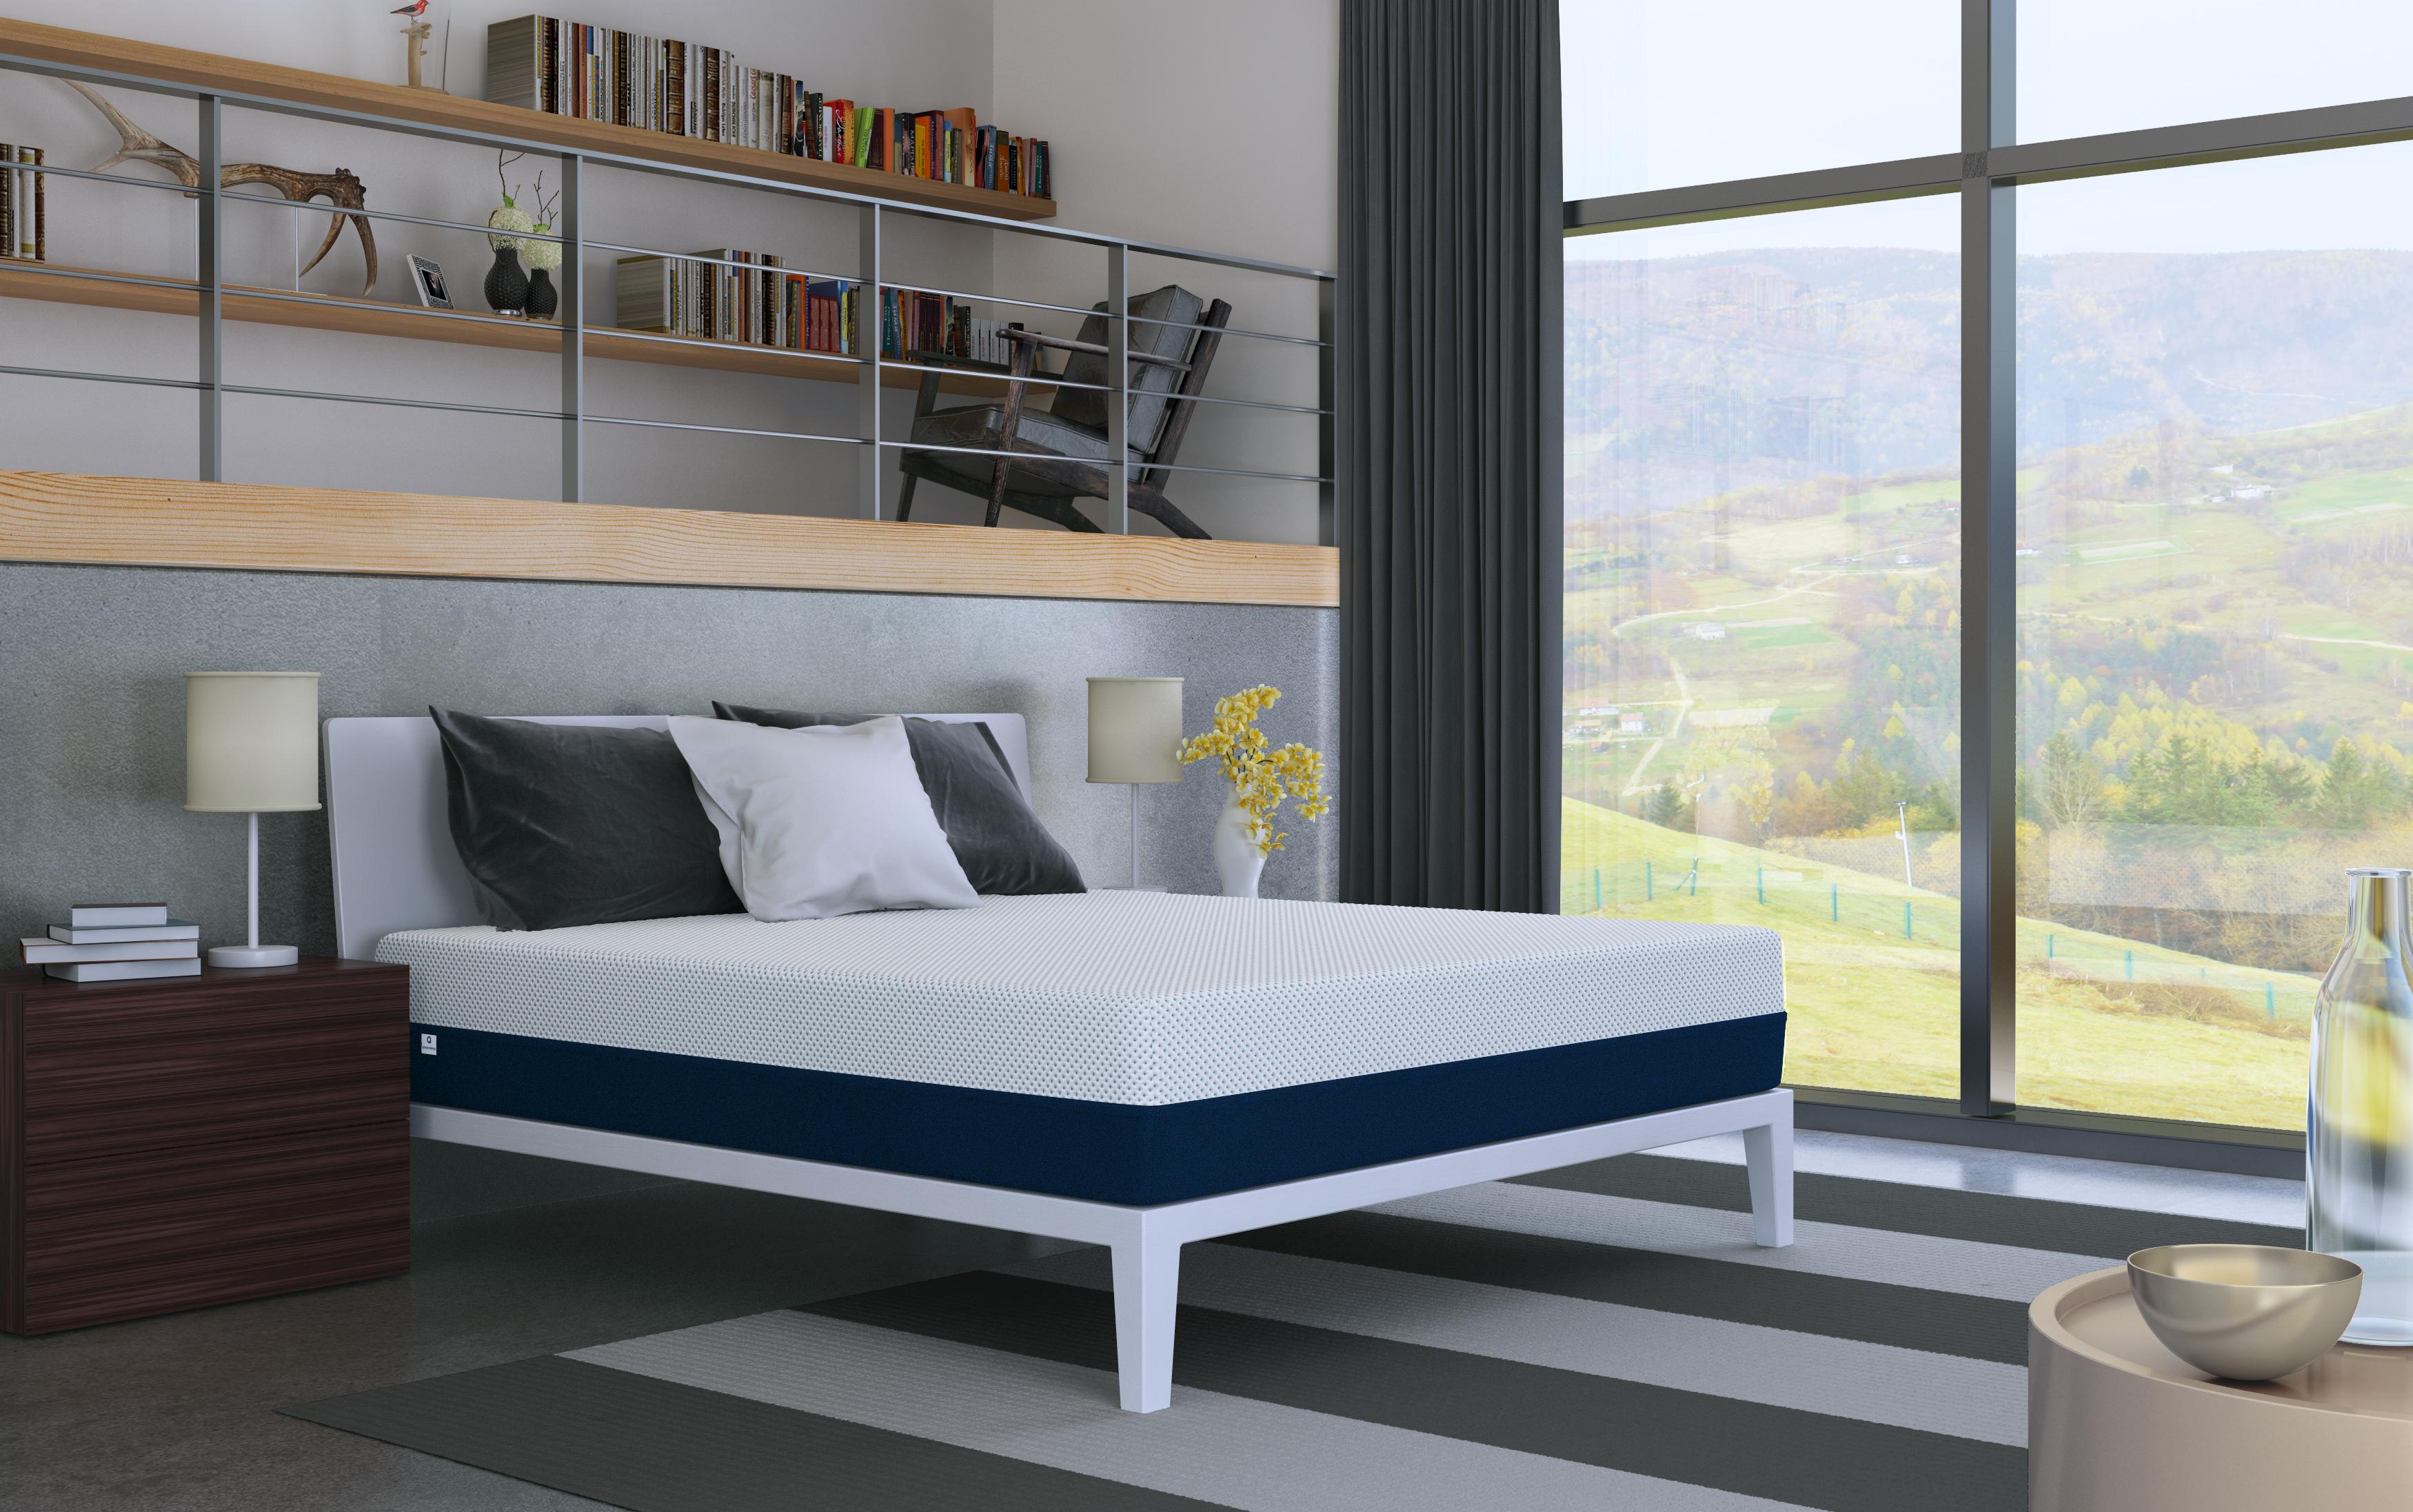 amerisleep has a great labor day mattress deal